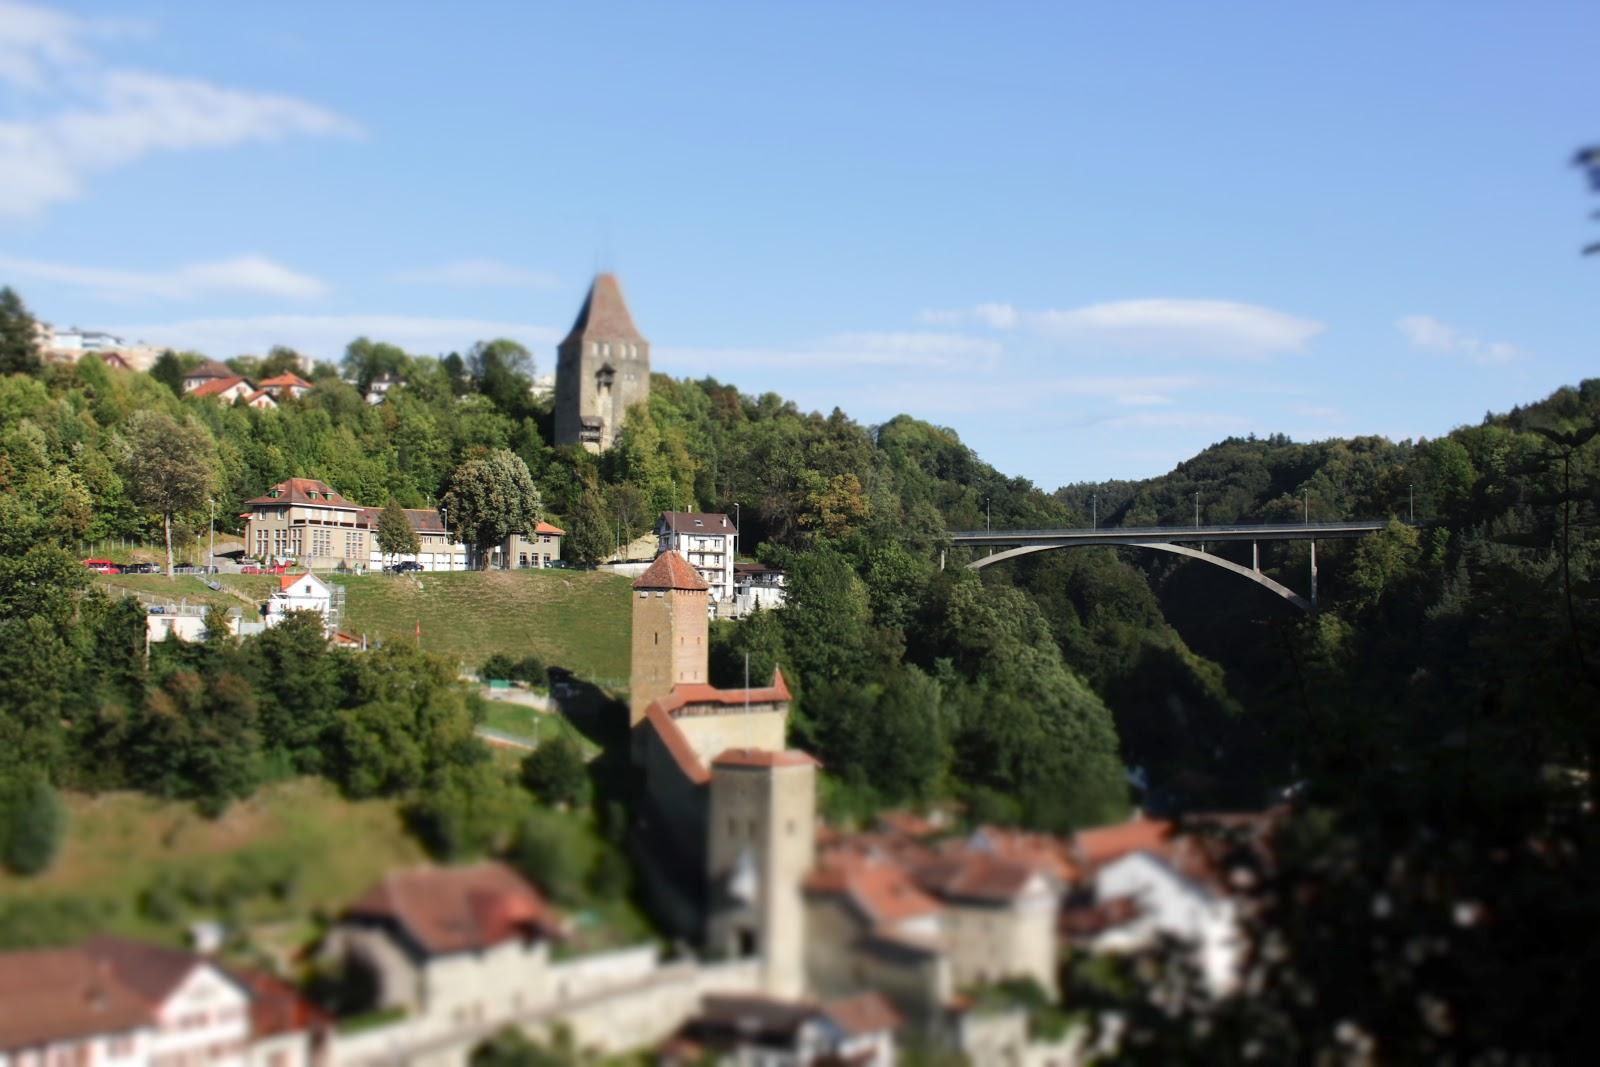 Fribourg Switzerland  city photos gallery : Fribourg, Switzerland